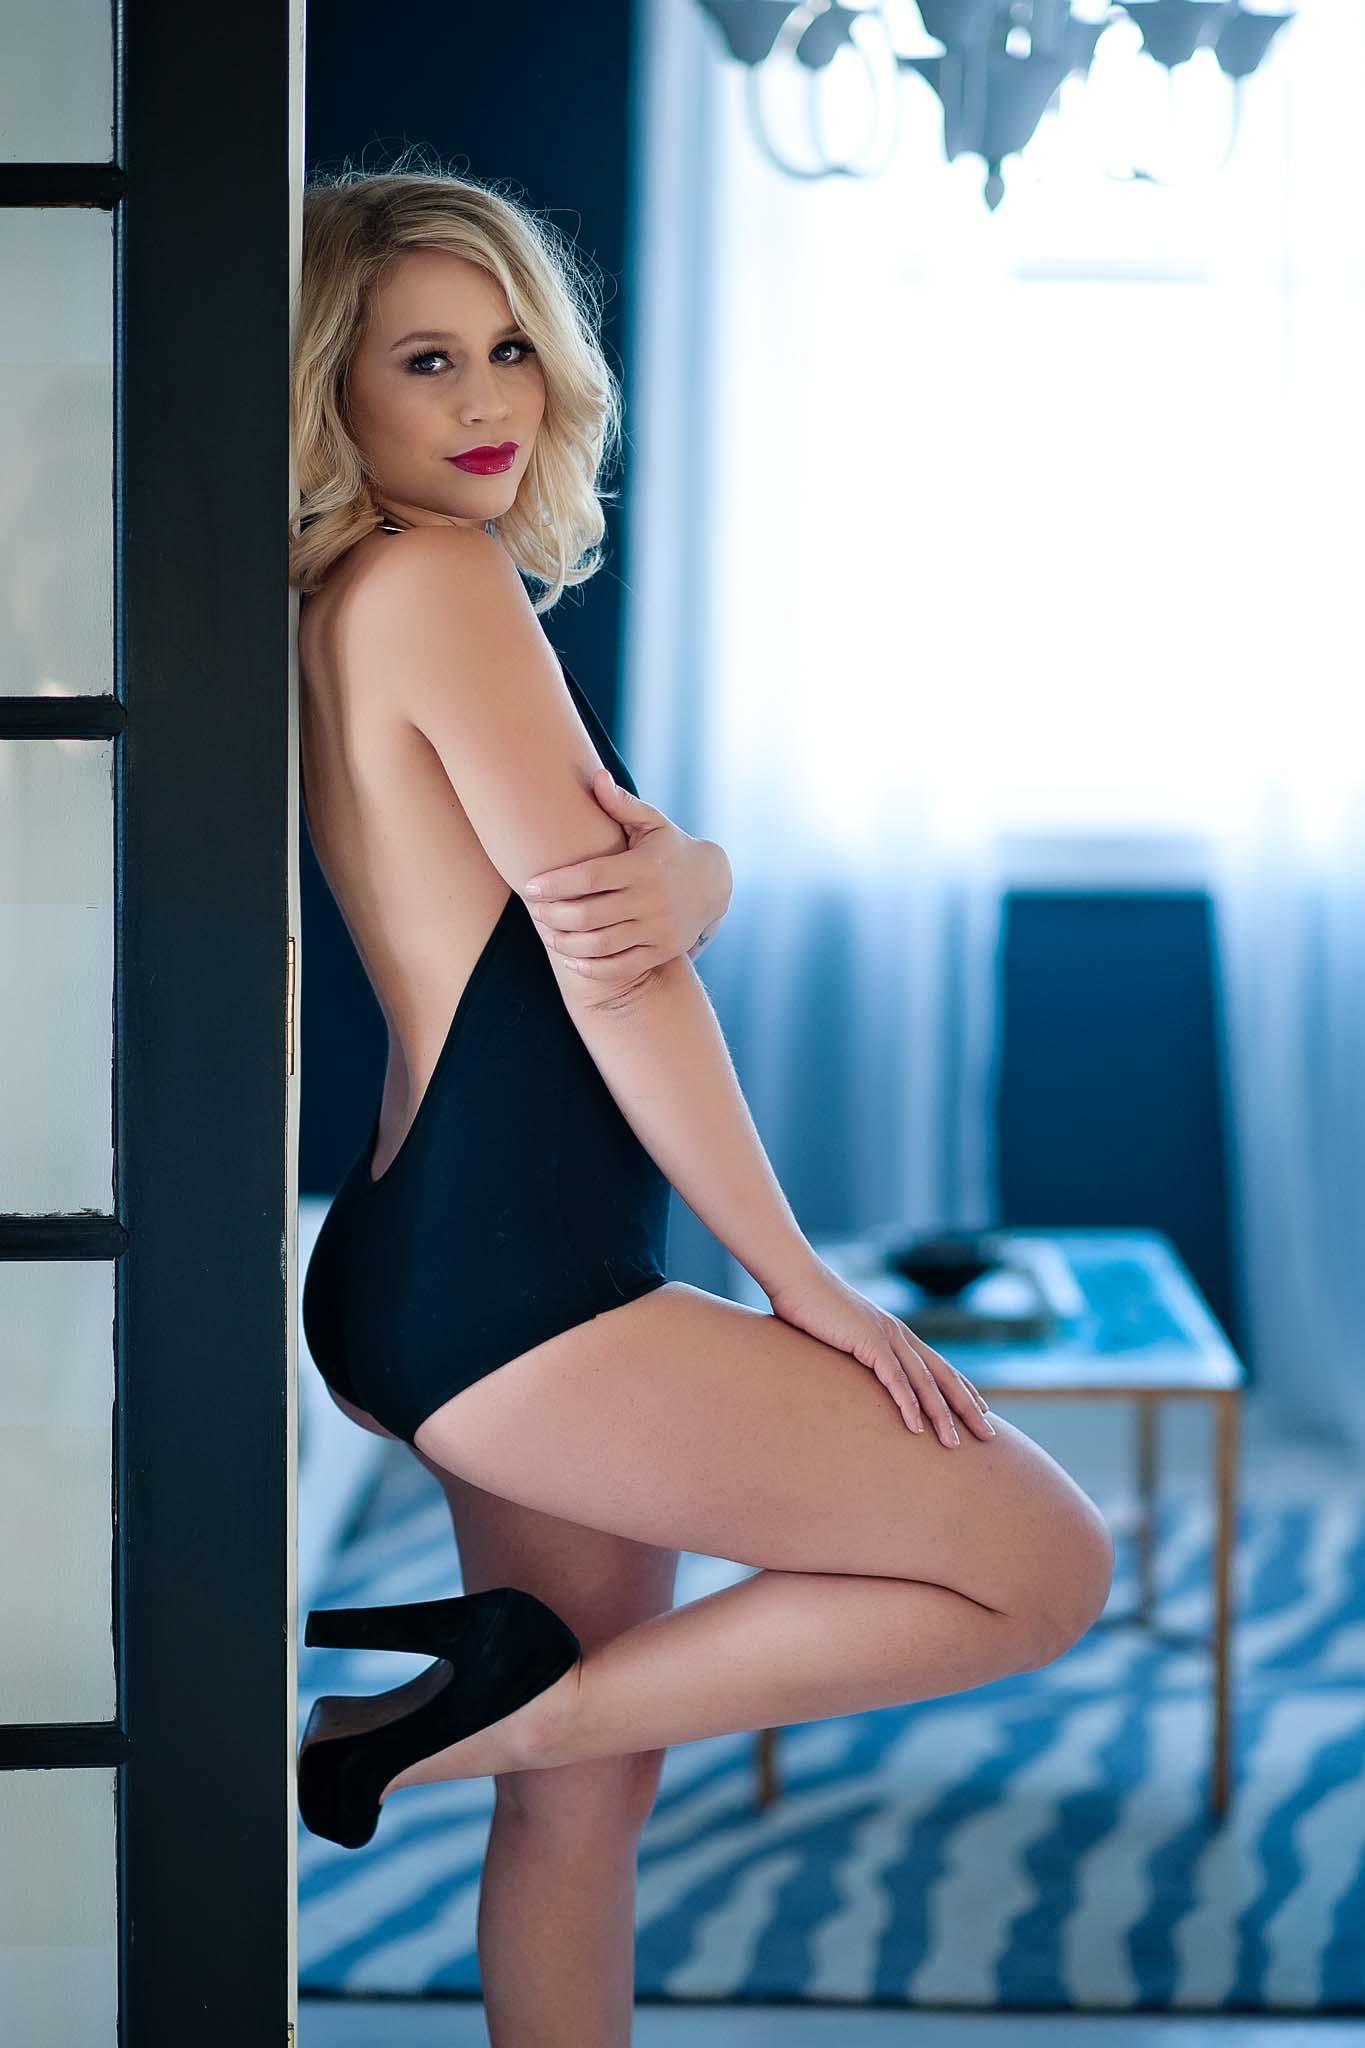 Johanna_0355.jpg